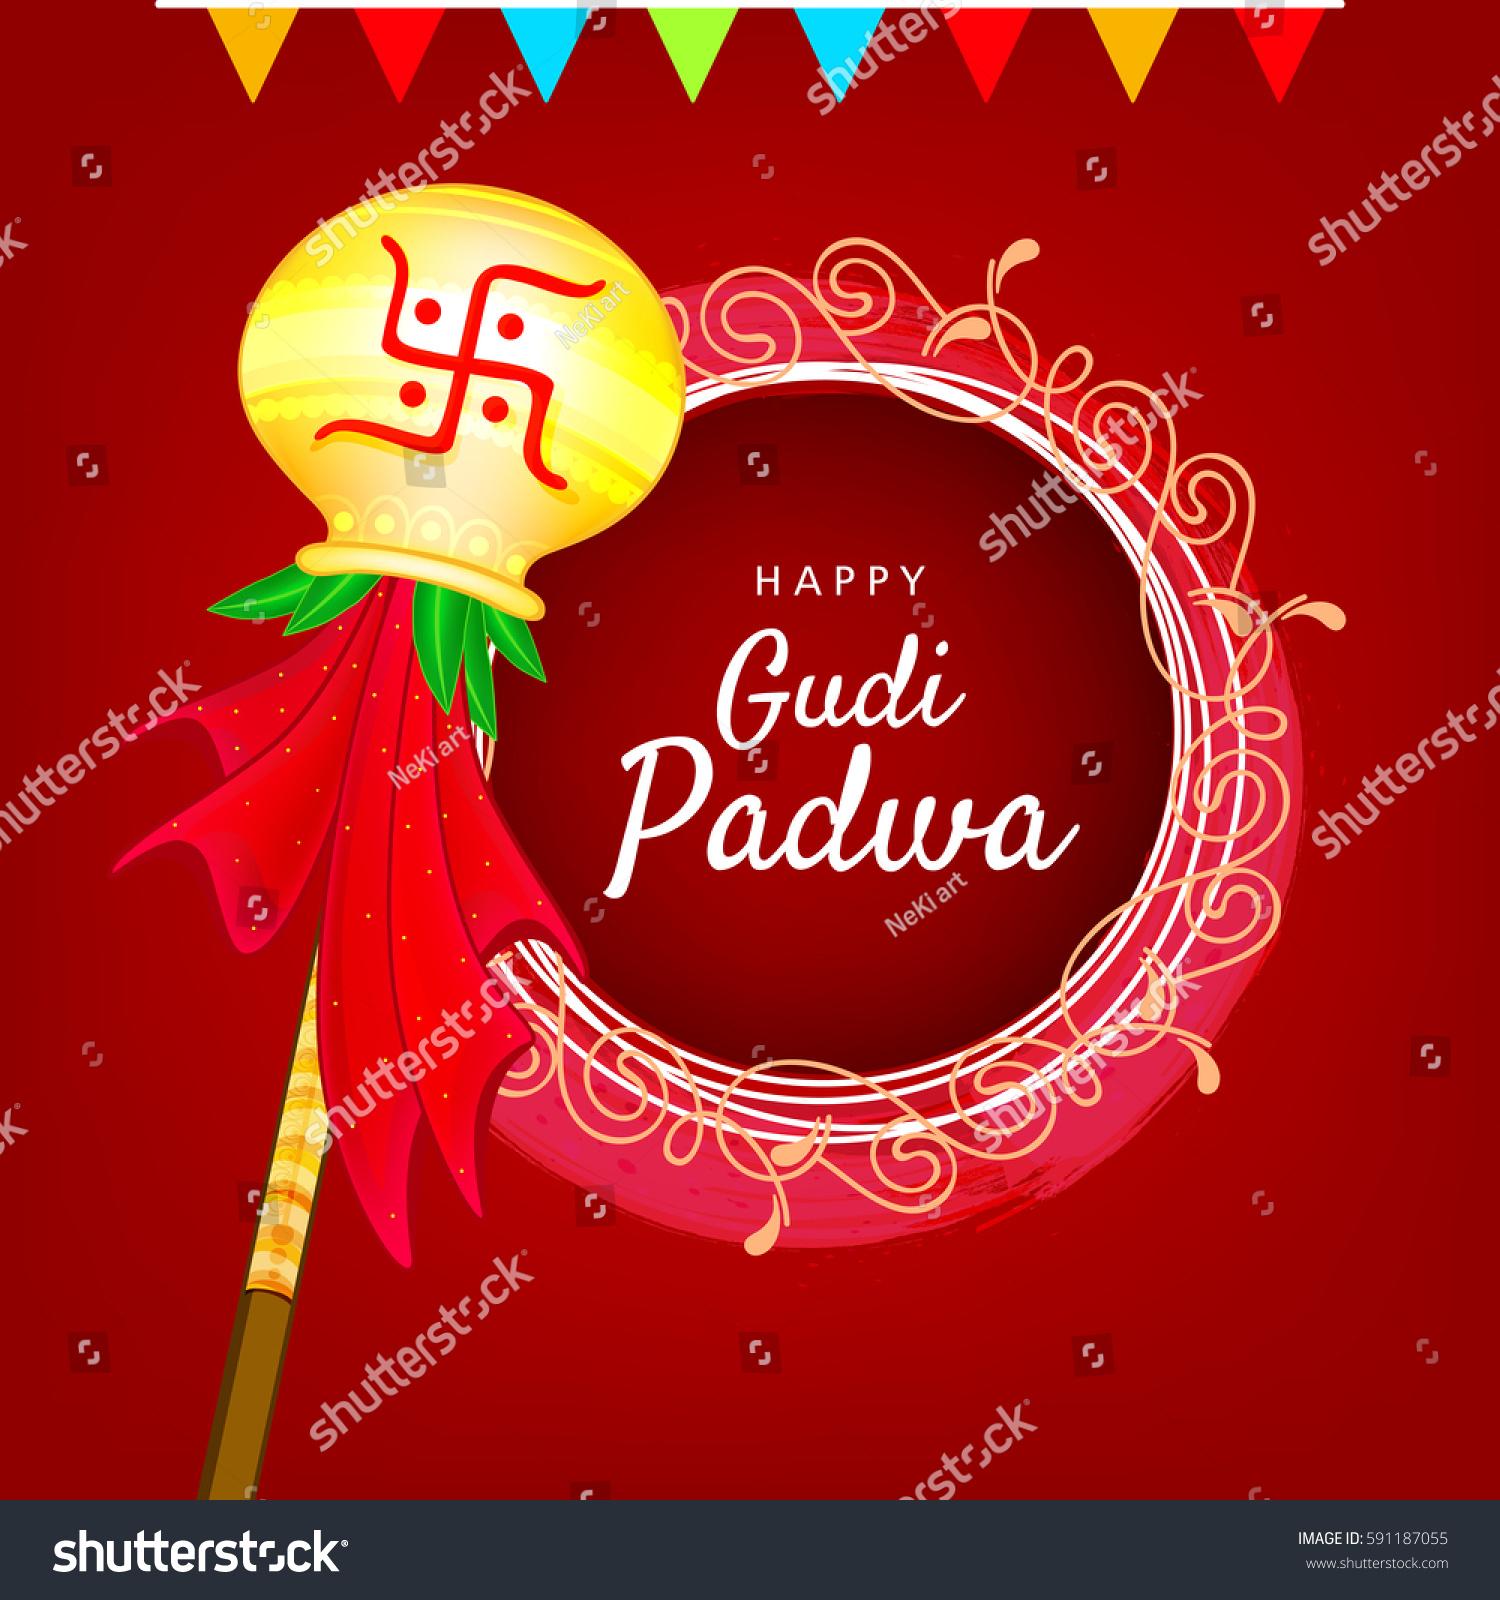 Happy Gudi Padwa Marathi New Year Stock Vector Royalty Free